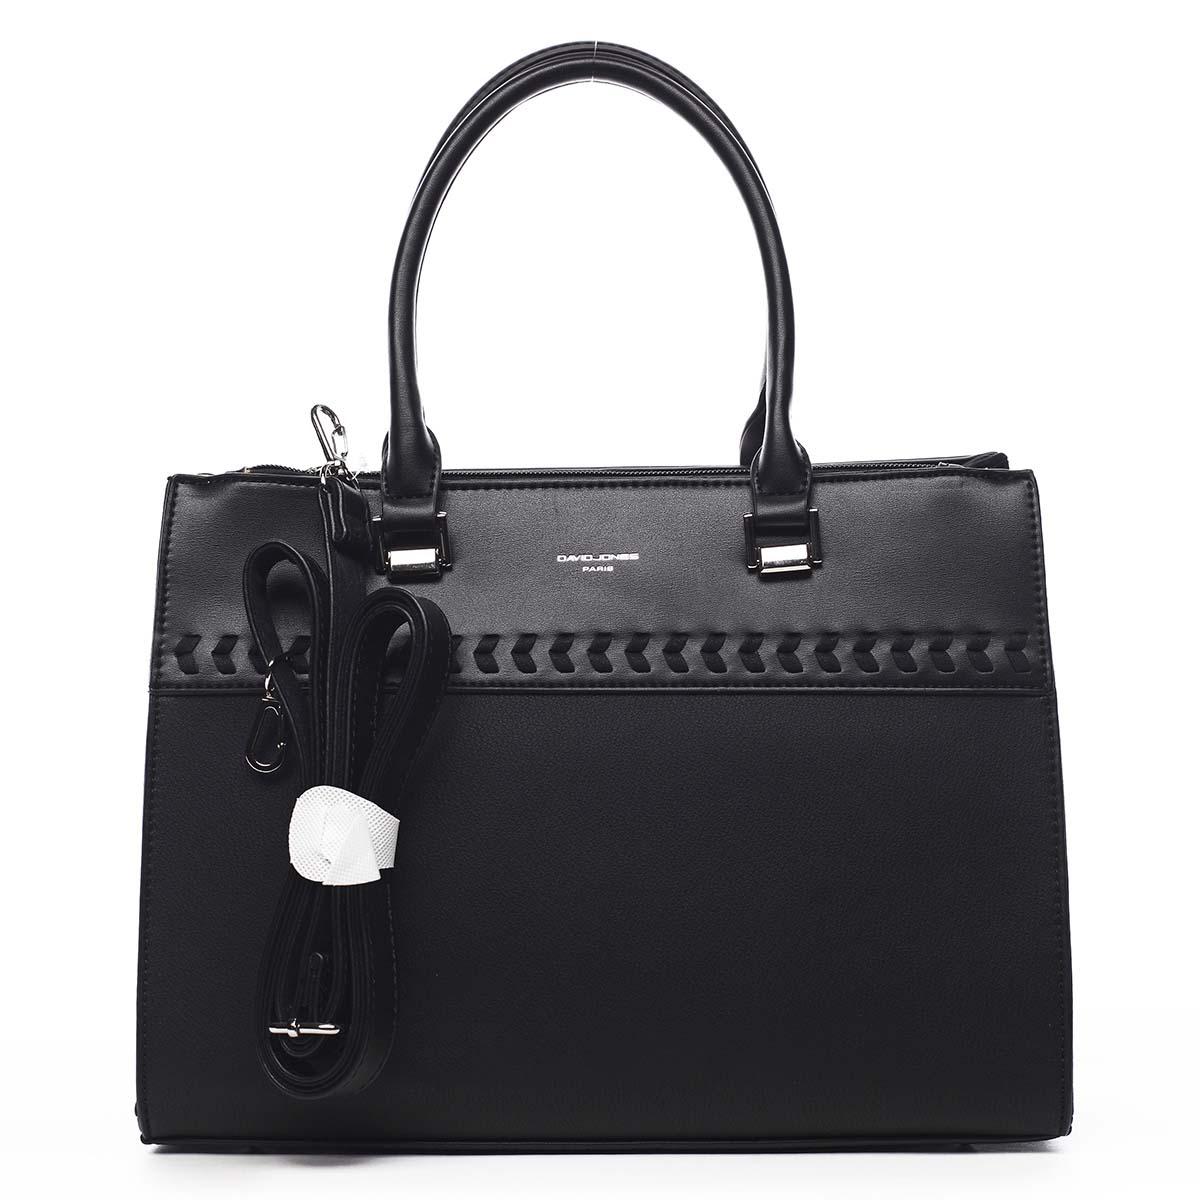 Dámska kabelka do ruky čierna - David Jones Tosmal čierna